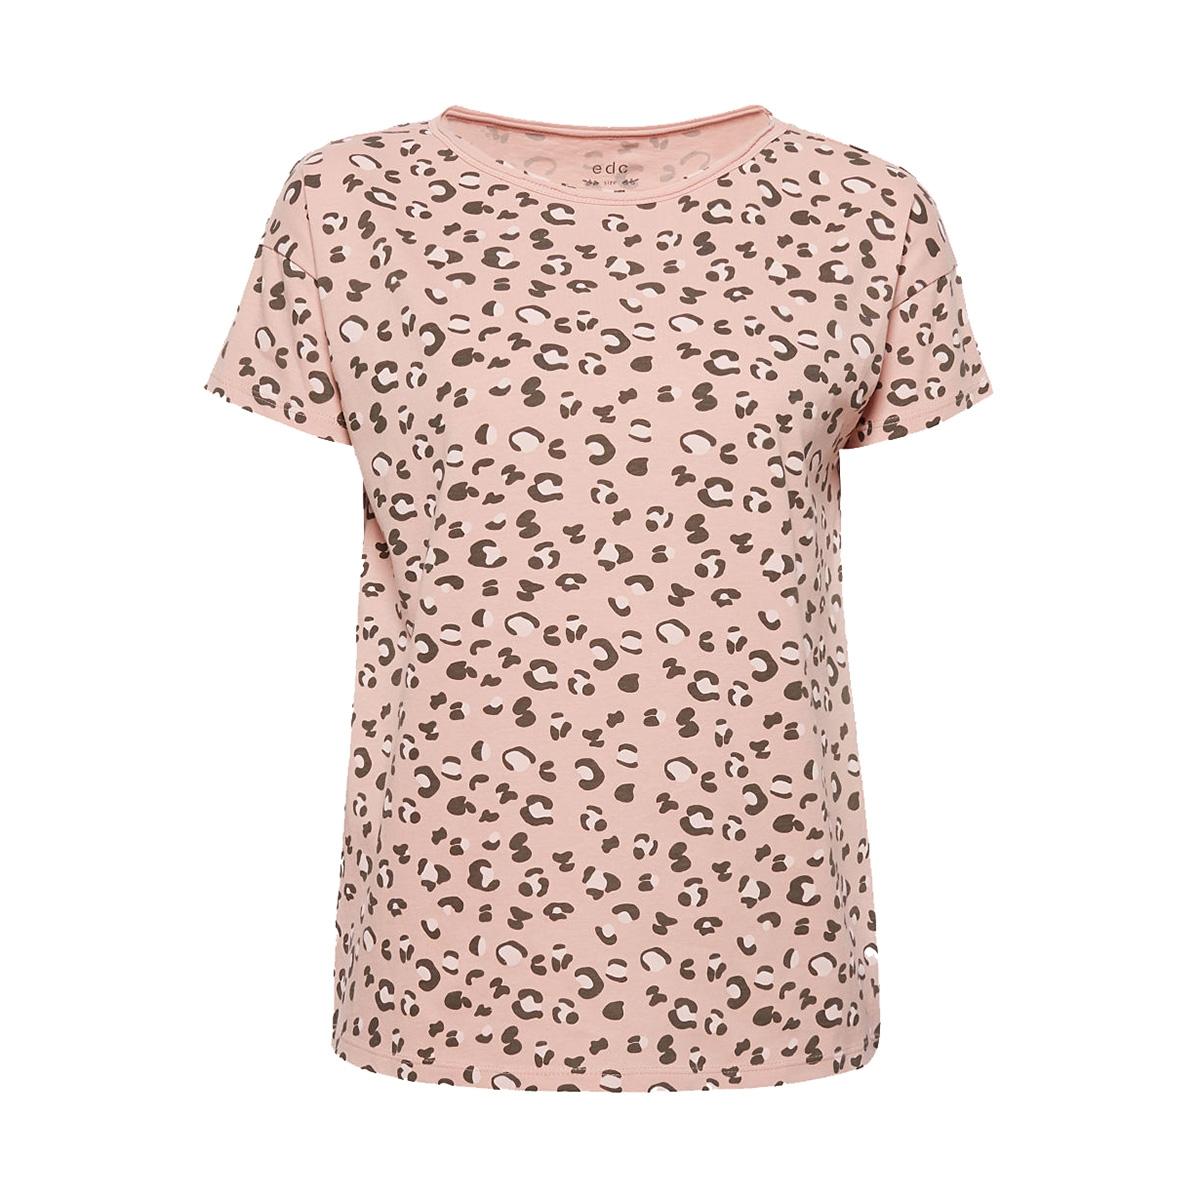 226829e93f9 shirt met print en onafgewerkte randen 029cc1k036 edc t-shirt c690